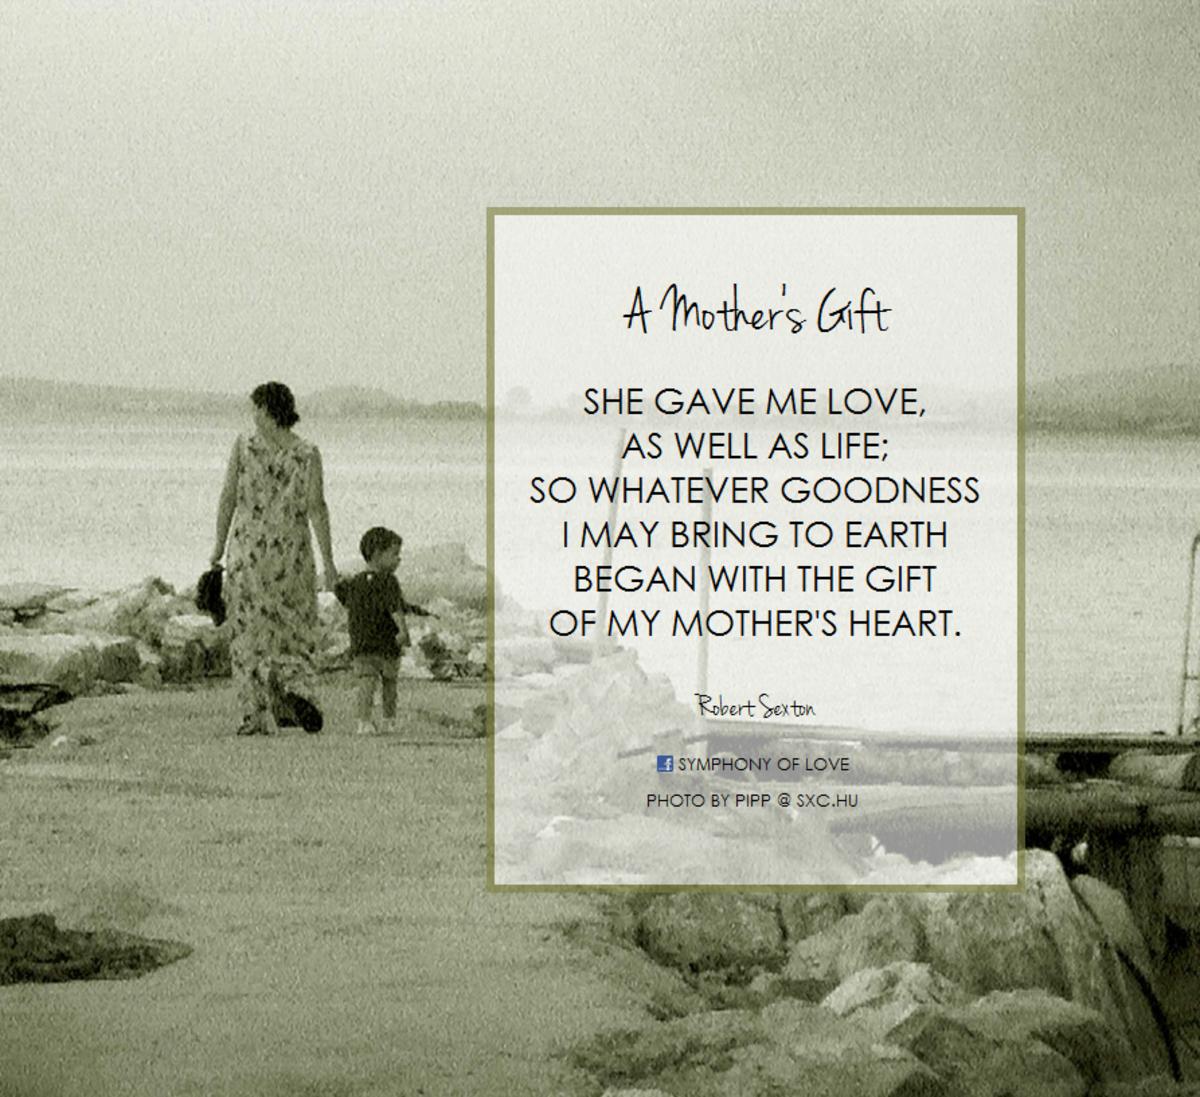 A Mother's Gift (short poem)